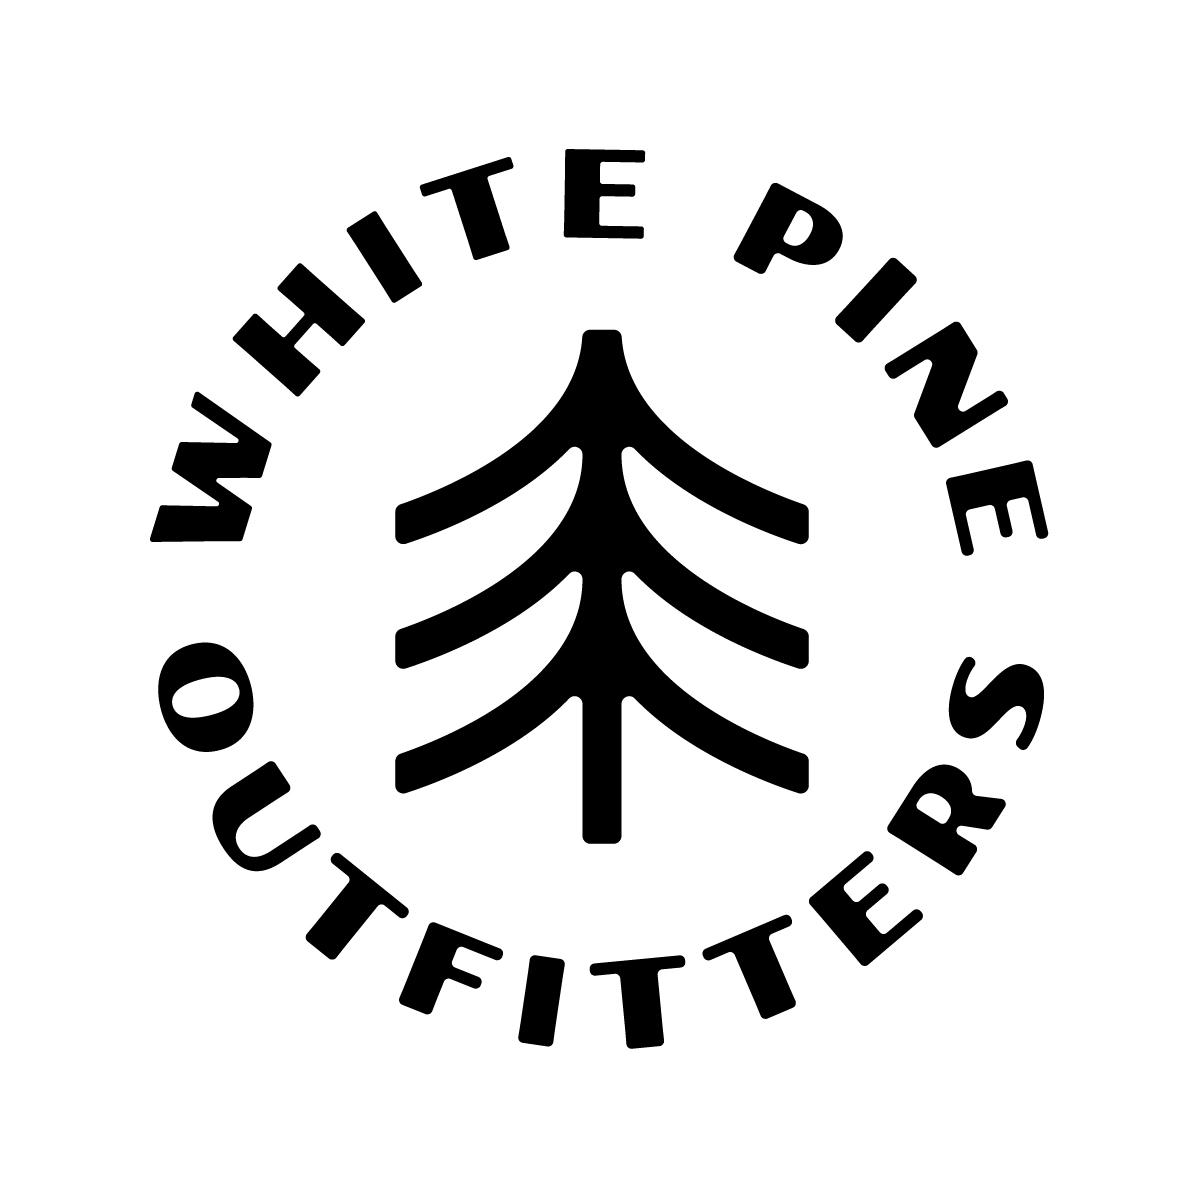 WhitePine_SimpleLogo-01.jpg